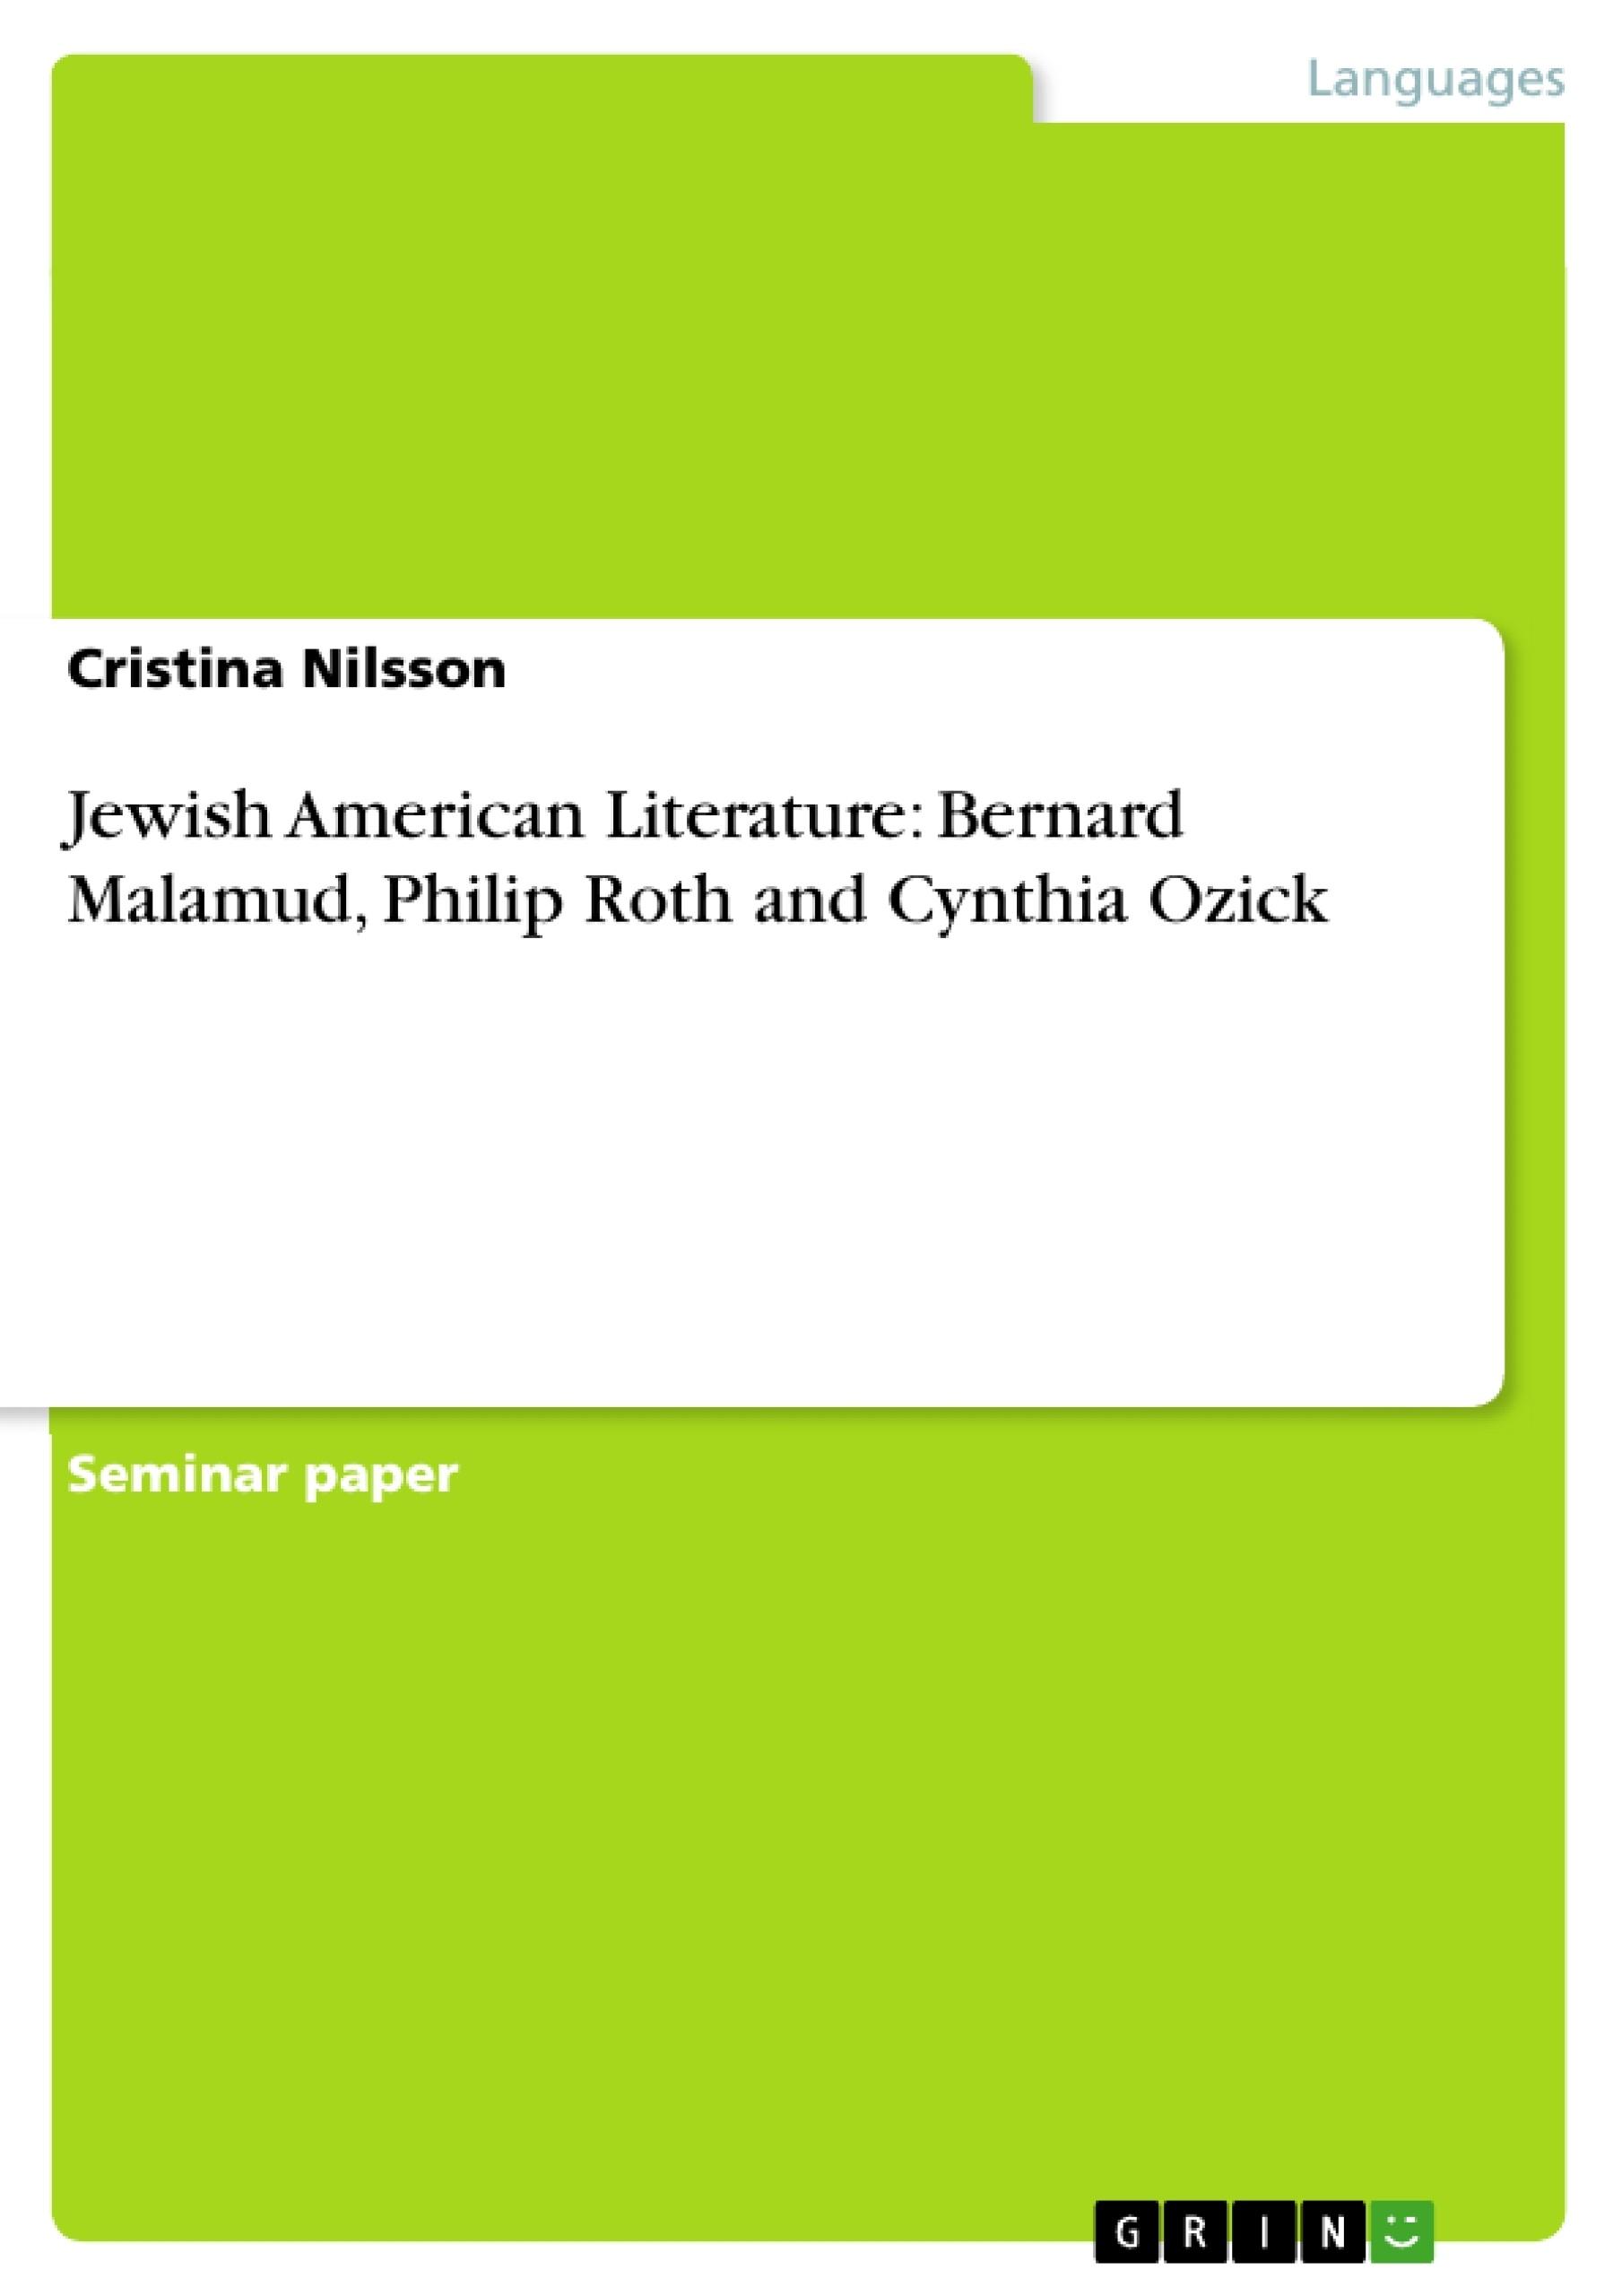 Title: Jewish American Literature: Bernard Malamud, Philip Roth and Cynthia Ozick